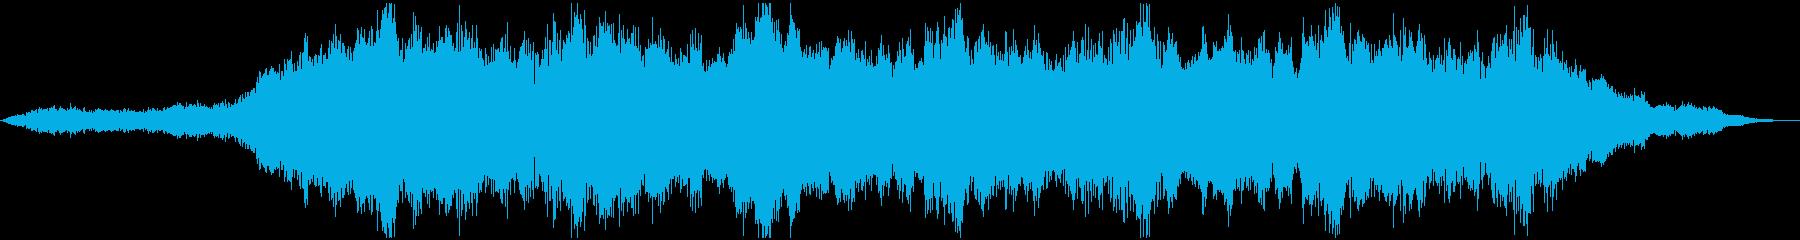 AMBIANCE 2 DARK M...の再生済みの波形